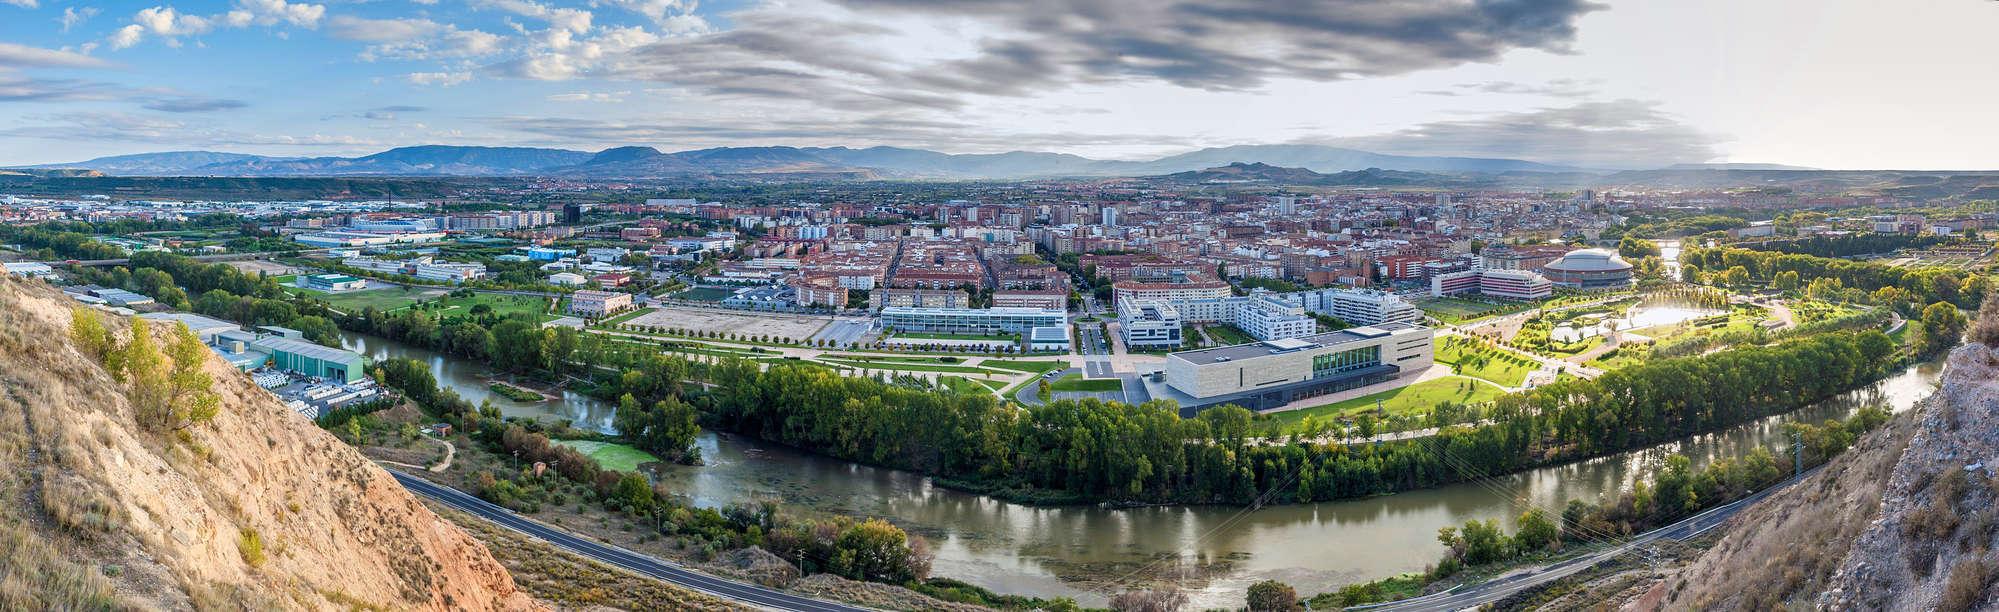 Logrono, hovedstaden i Rioja, Spanien